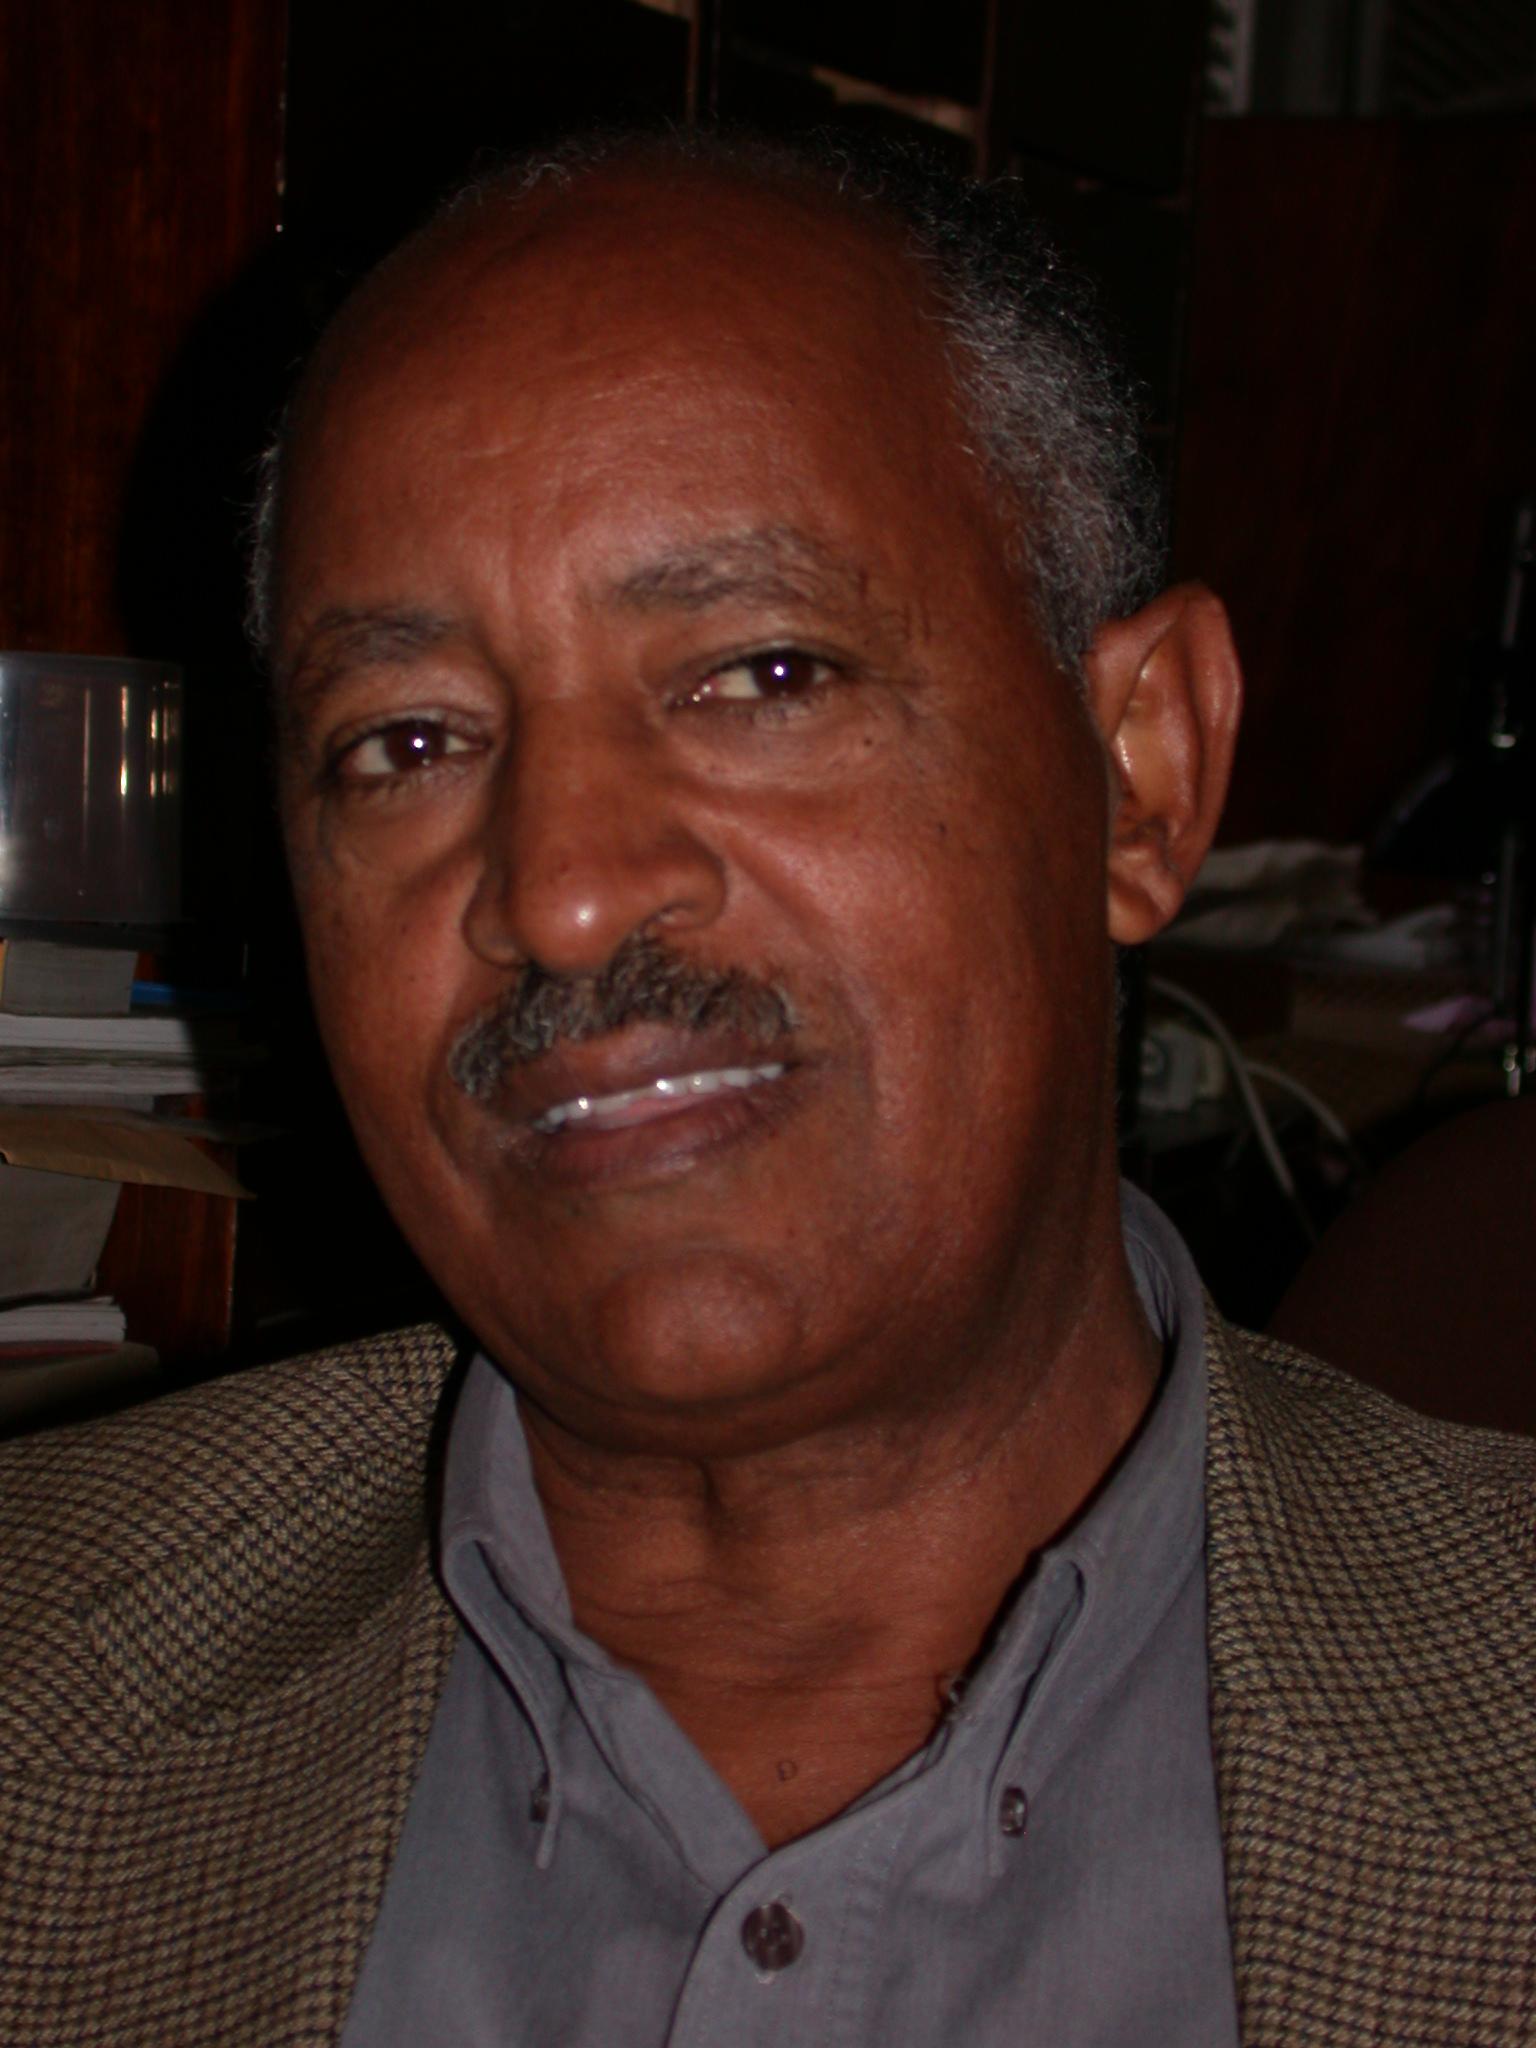 Dr. Berhane Asfaw, Ethiopian Archaeologist